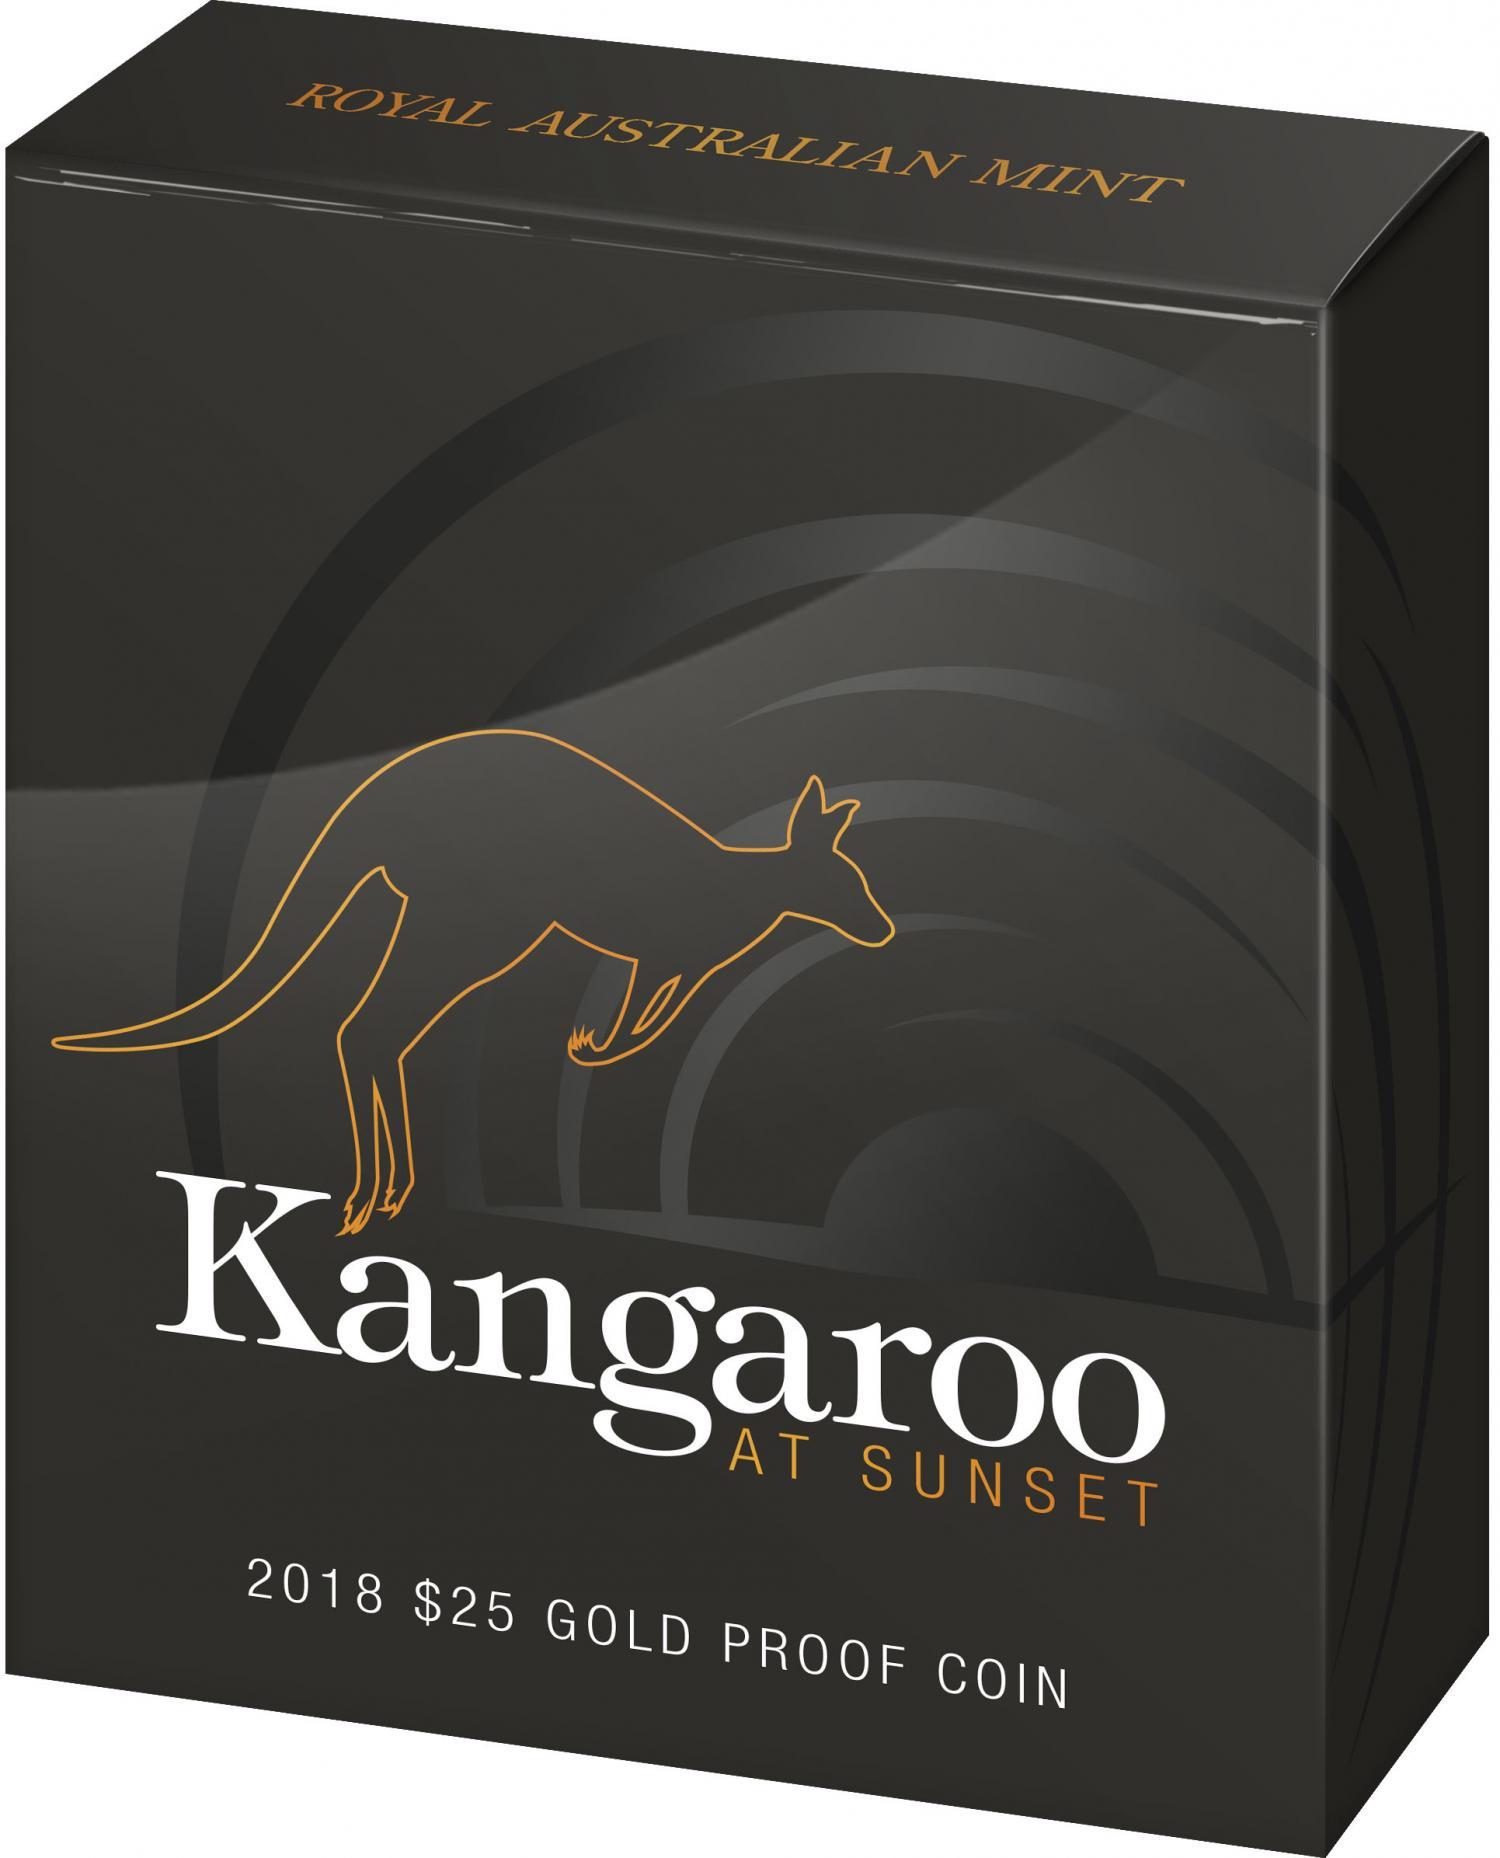 Thumbnail for 2018 $25 Gold Proof Coin - Kangaroo at Sunset